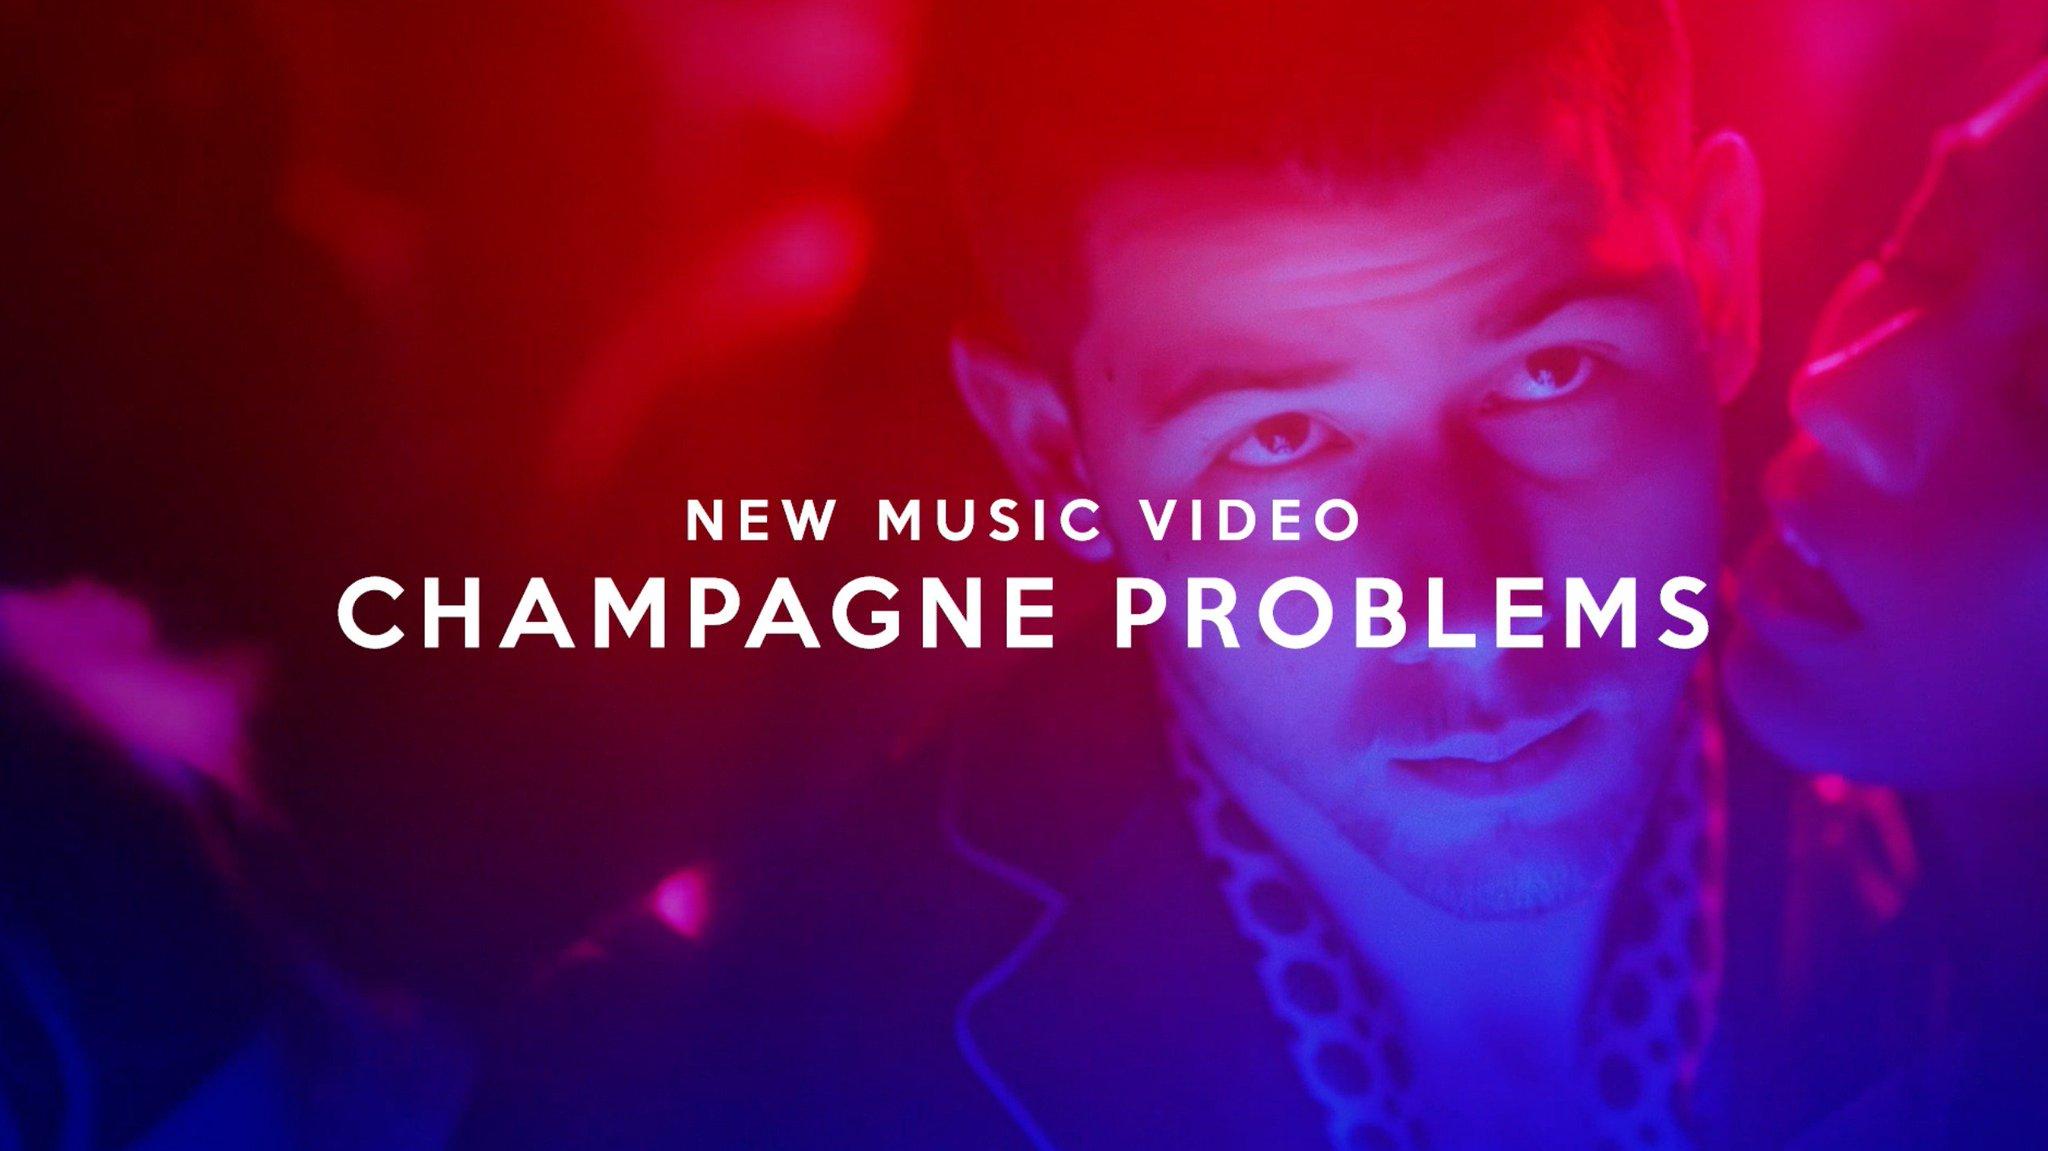 Champagne Problems video is here! Watch it exclusively on @TidalHiFi now. https://t.co/l5Z3LrMMpb #TIDALXNICKJONAS https://t.co/AwgJ4l0VU2